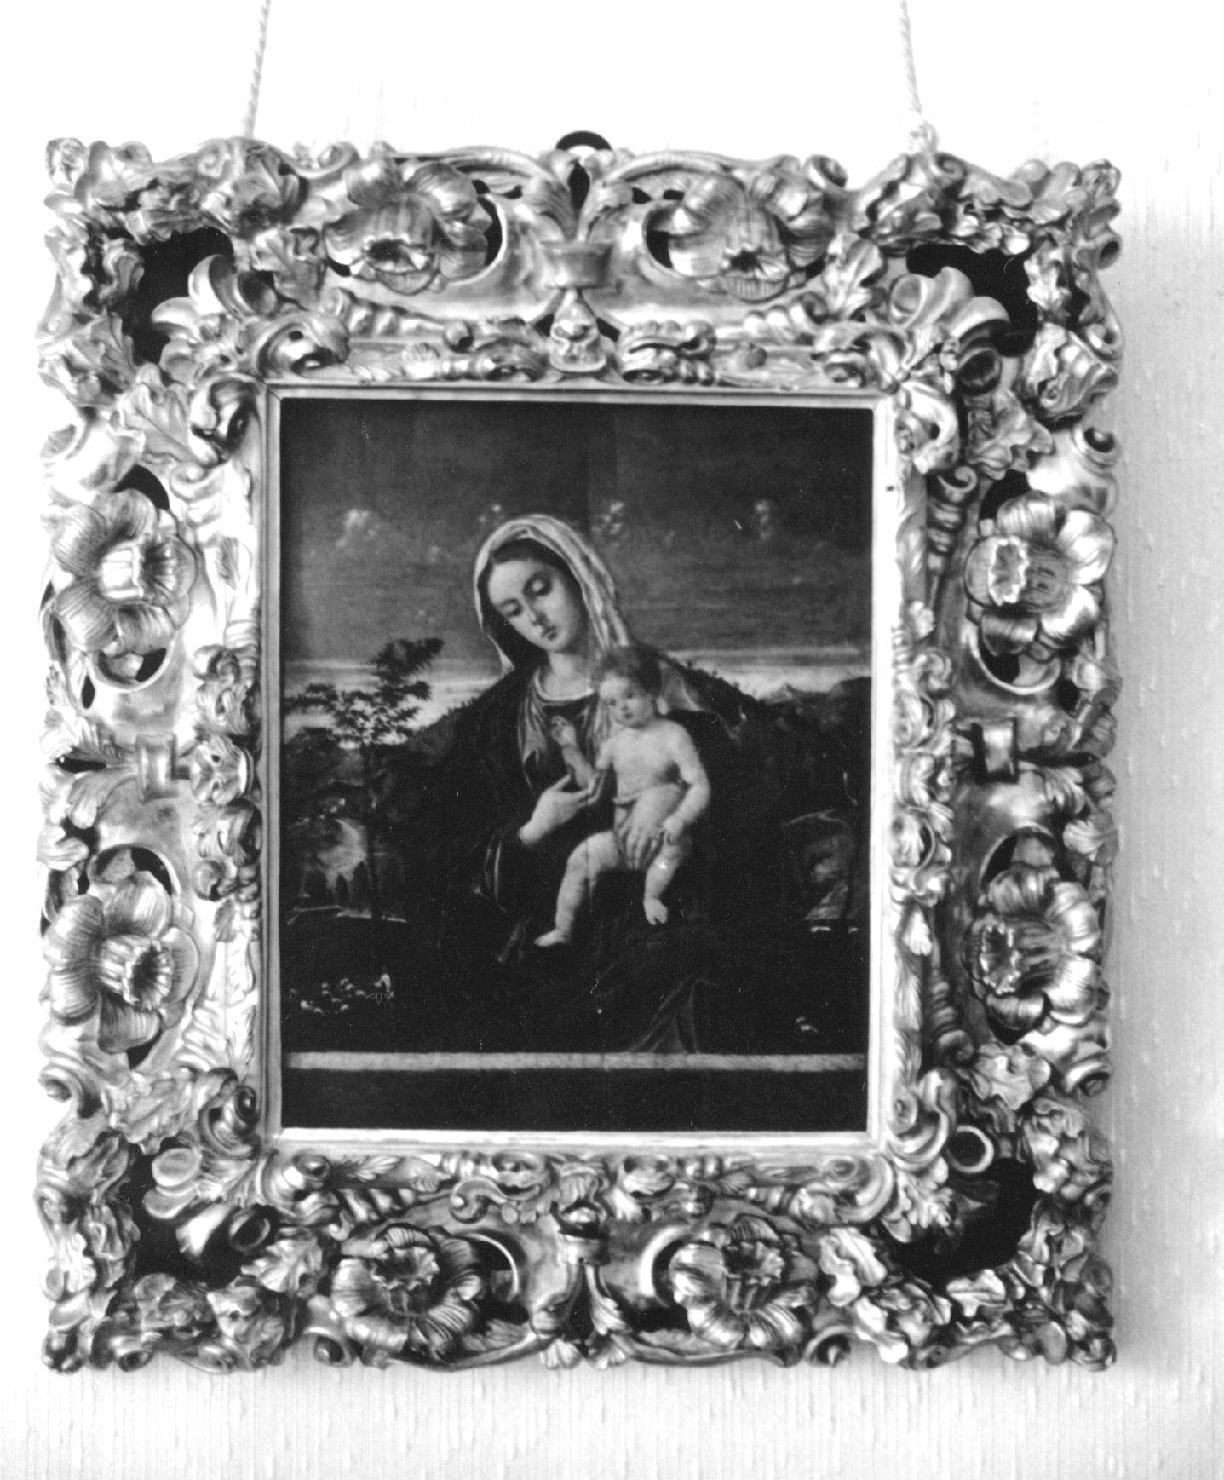 cornice, opera isolata - manifattura veneziana (sec. XVIII)